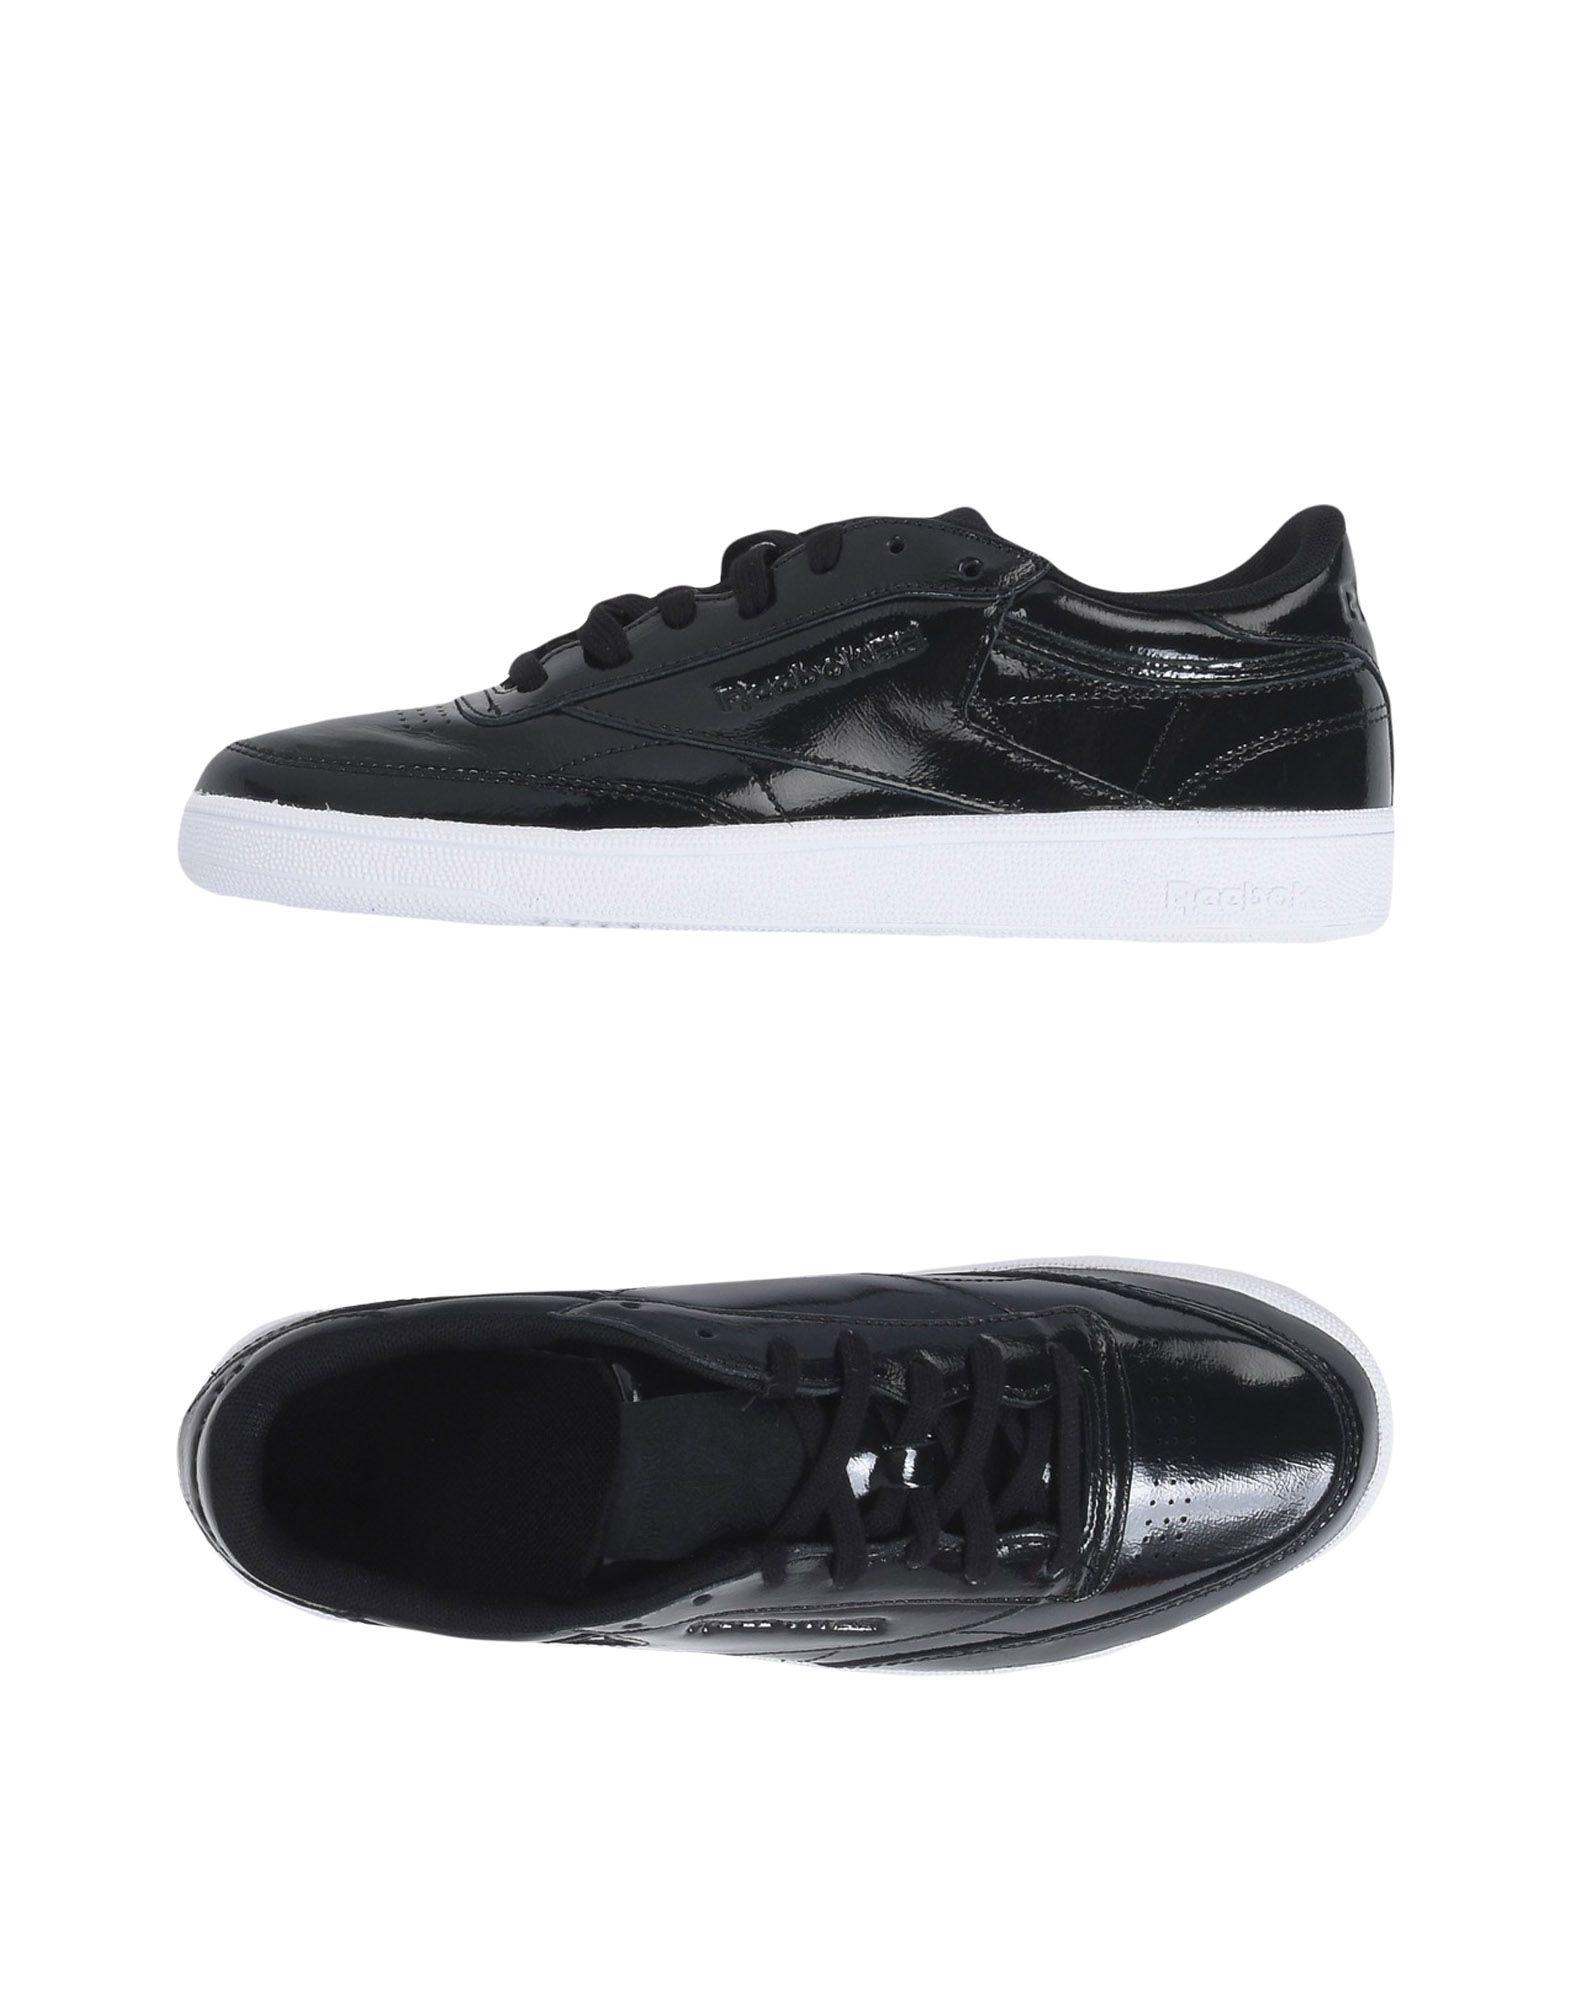 Sneakers Reebok Club C 85 Patent - Donna - Acquista online su